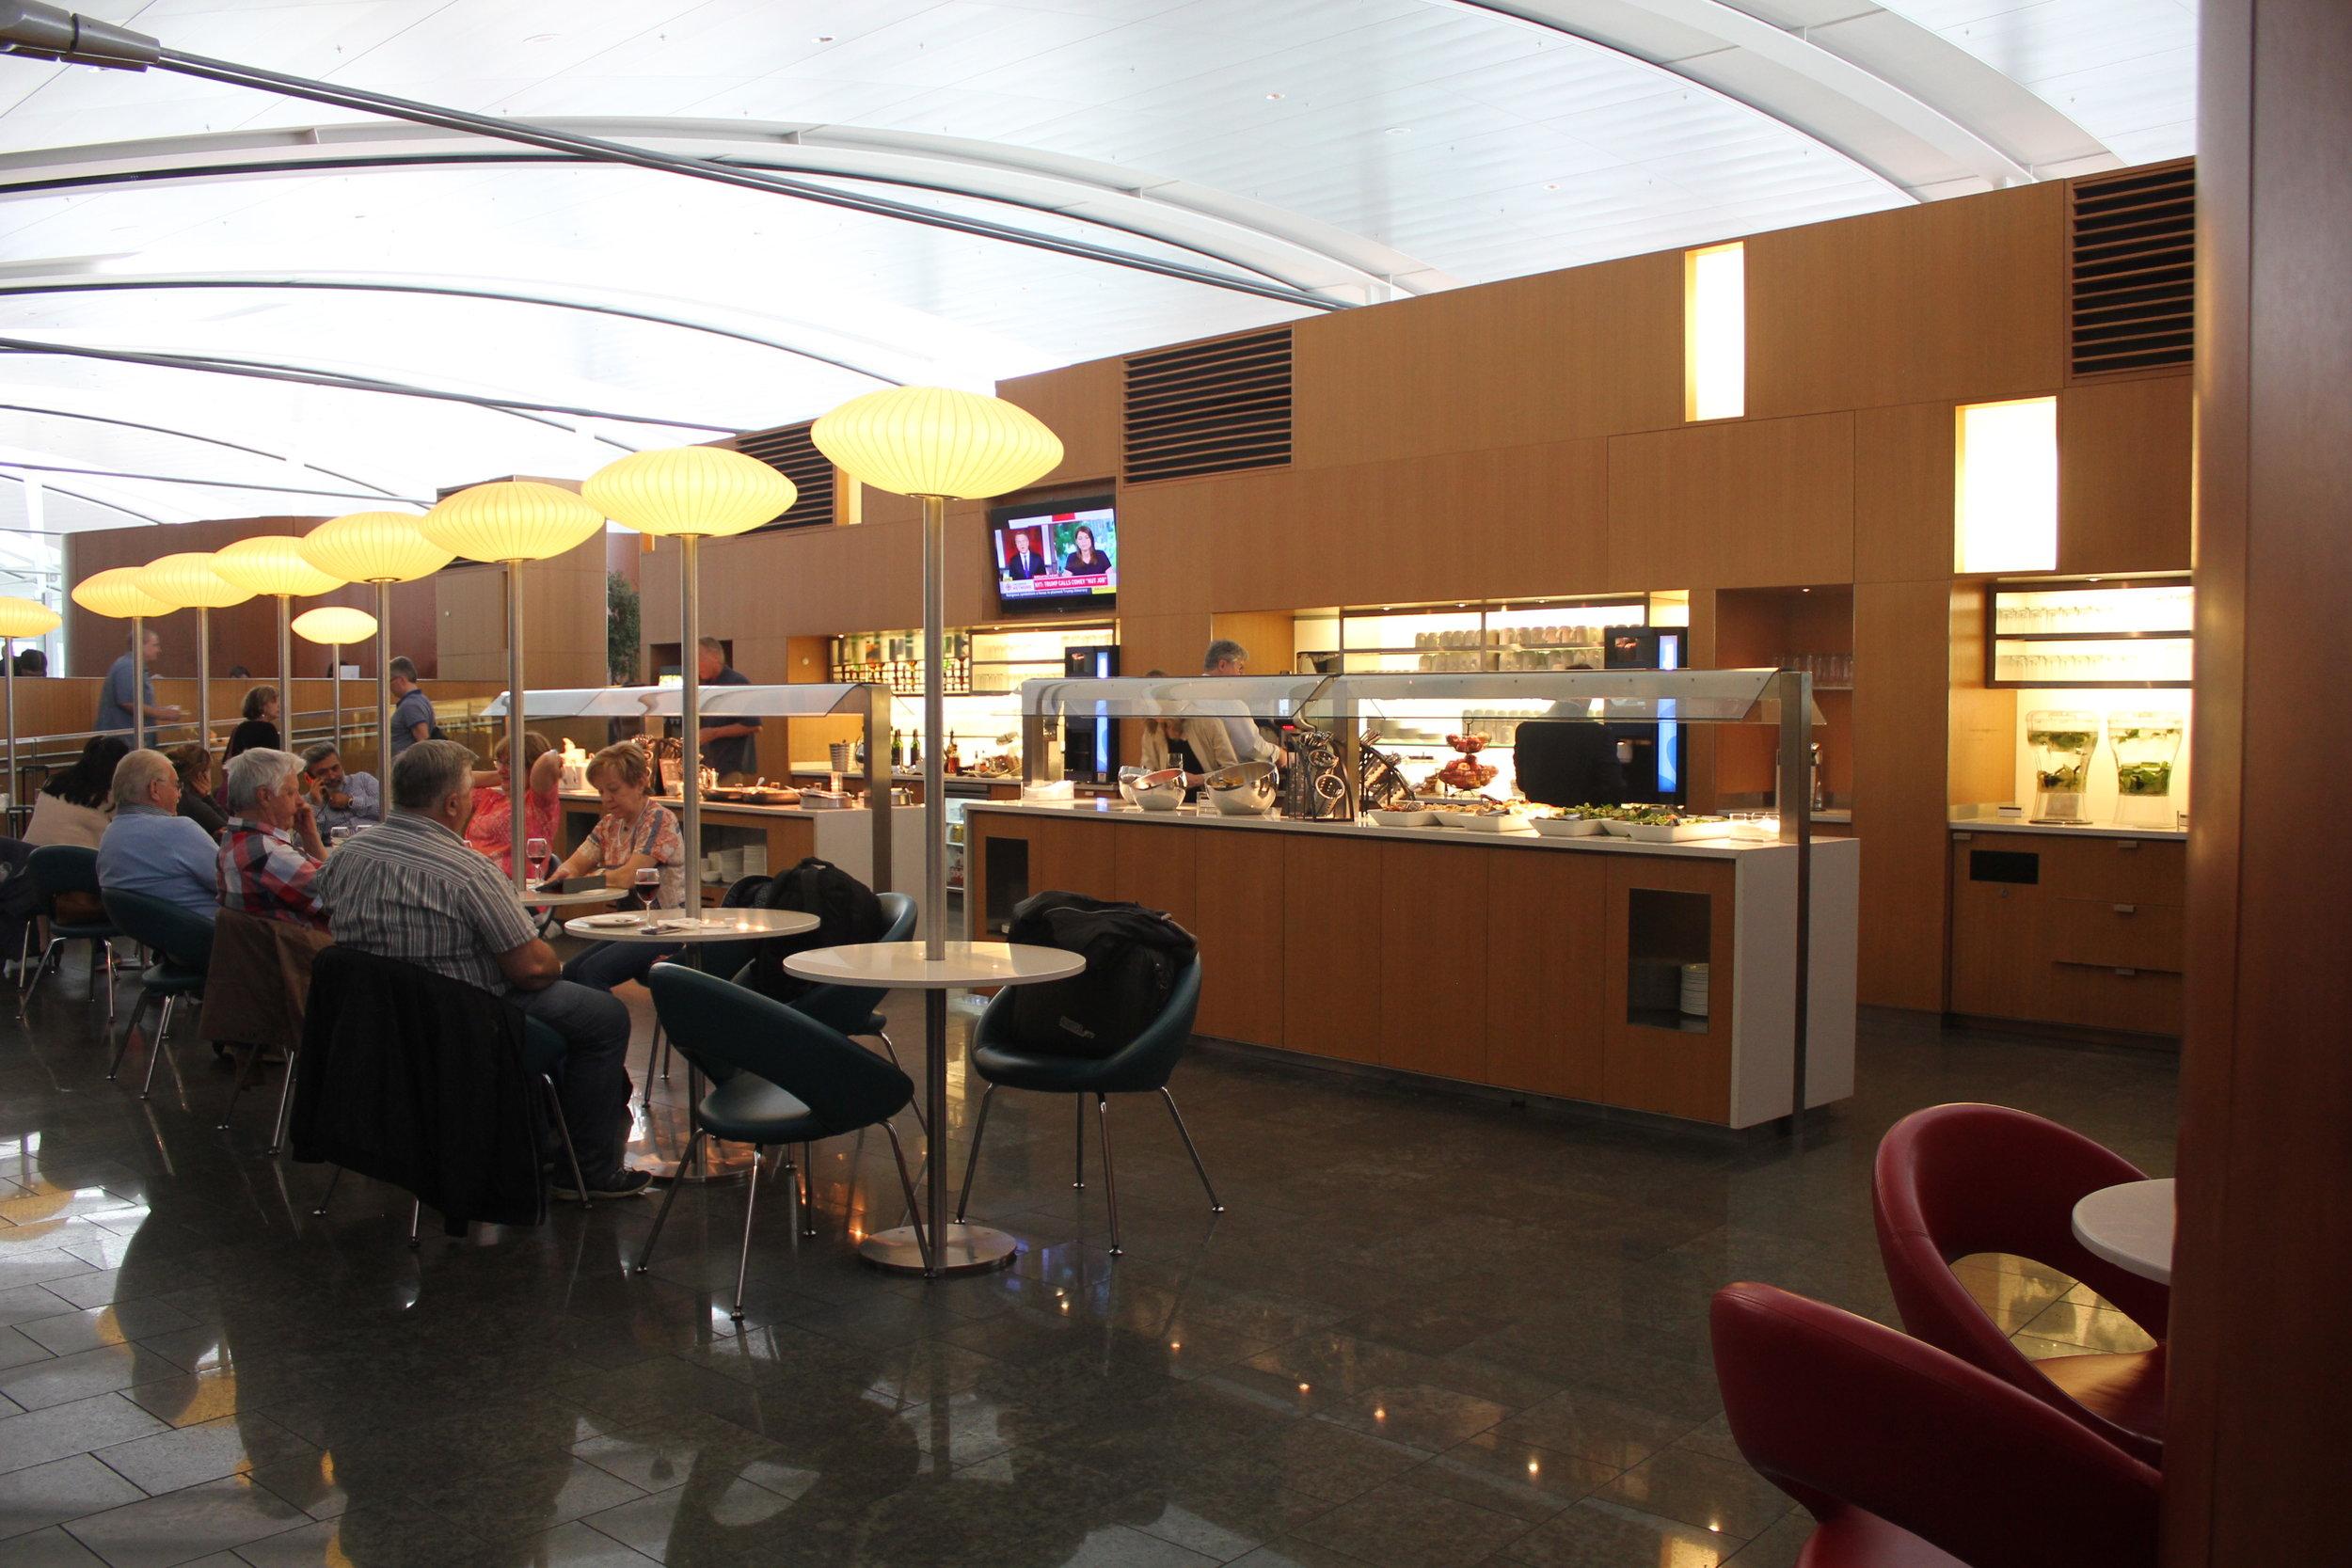 Air Canada Maple Leaf Lounge Toronto (International) – Main dining area